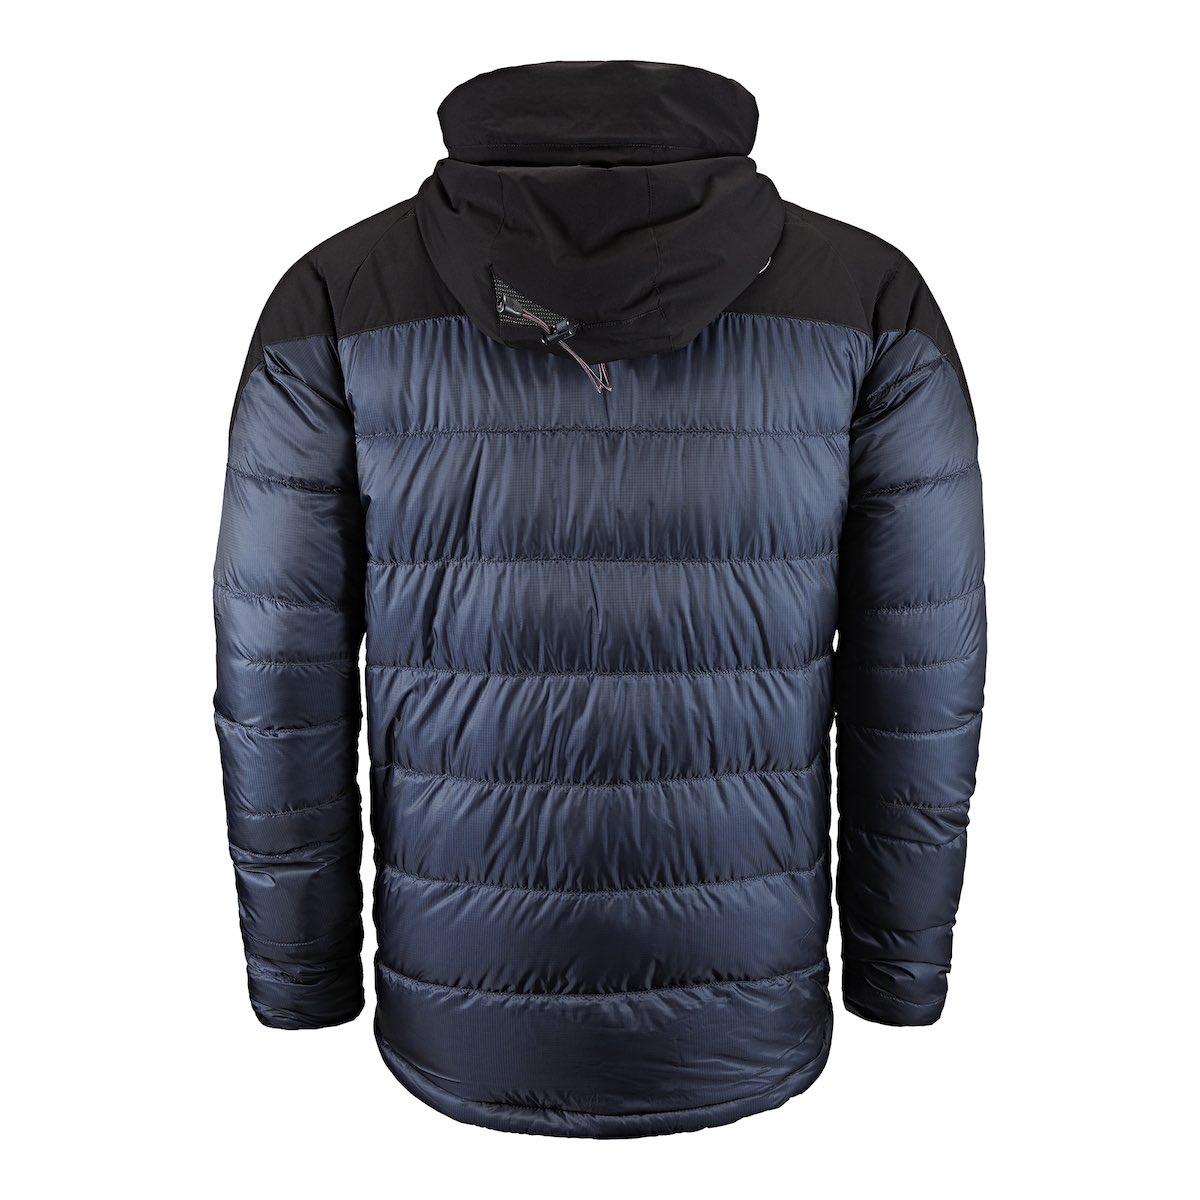 fca522f0 Klättermusen Atle 2.0 Jacket M's Storm Blue | Fjellsport.no